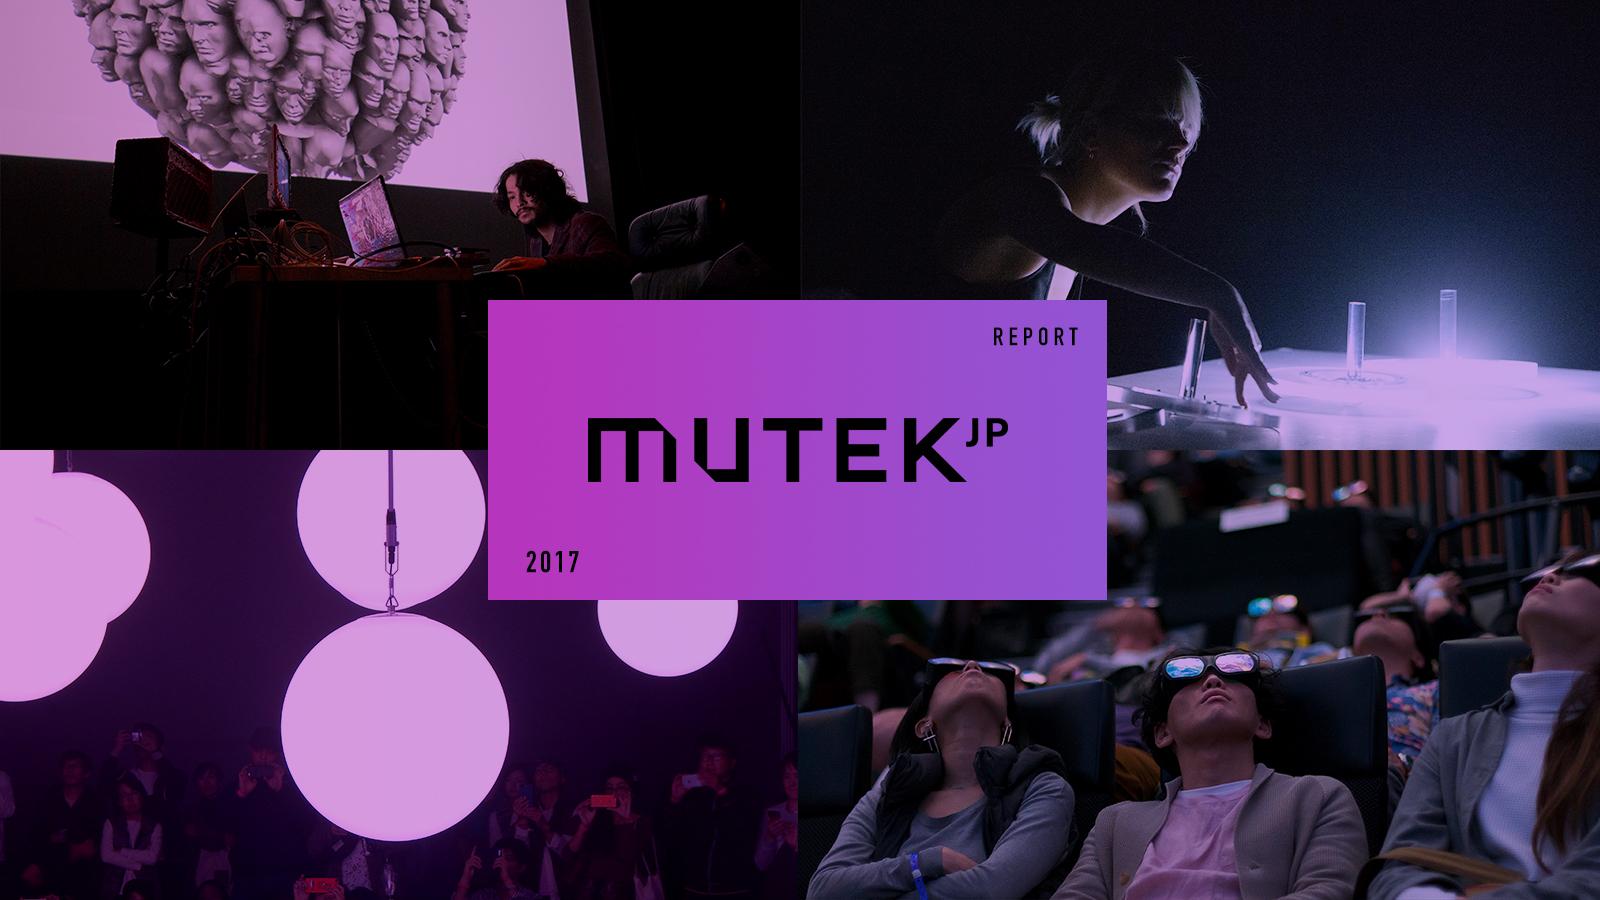 MUTEK JP 2017